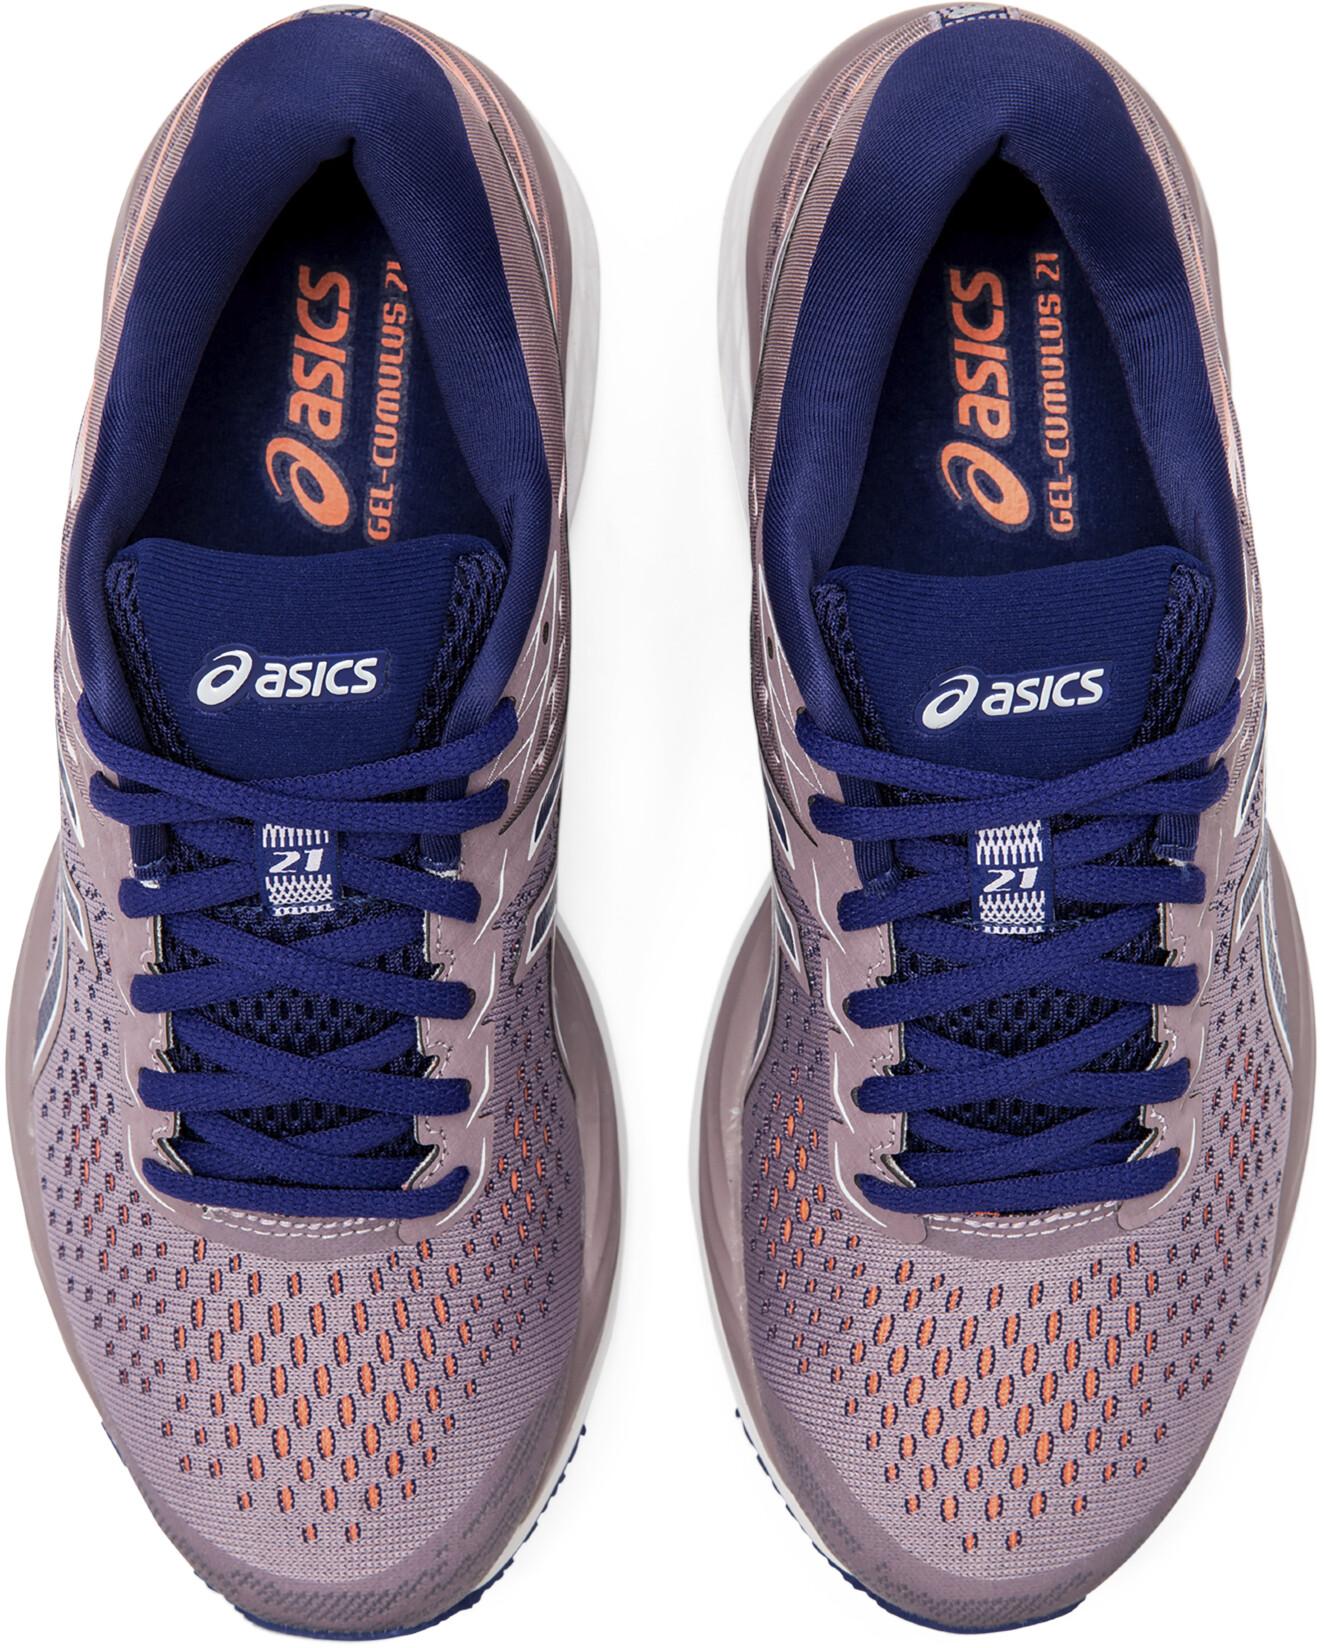 21 Blushdive Gel Asics WomenViolet Blue Shoes Cumulus 4R5ALj